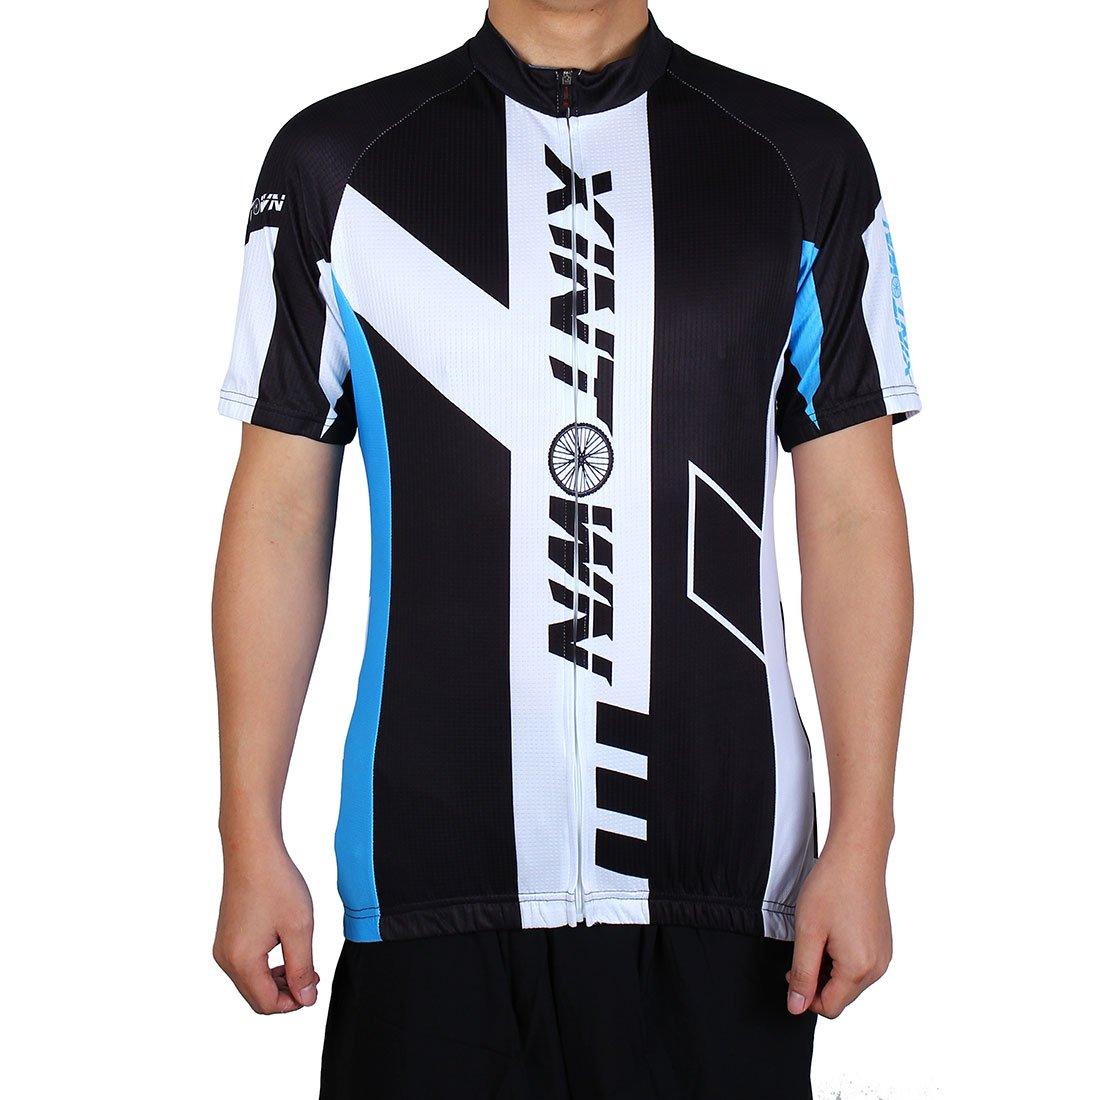 8e60003b5b48 Amazon.com : uxcell XINTOWN Authorized Adult Man Short Sleeve ...